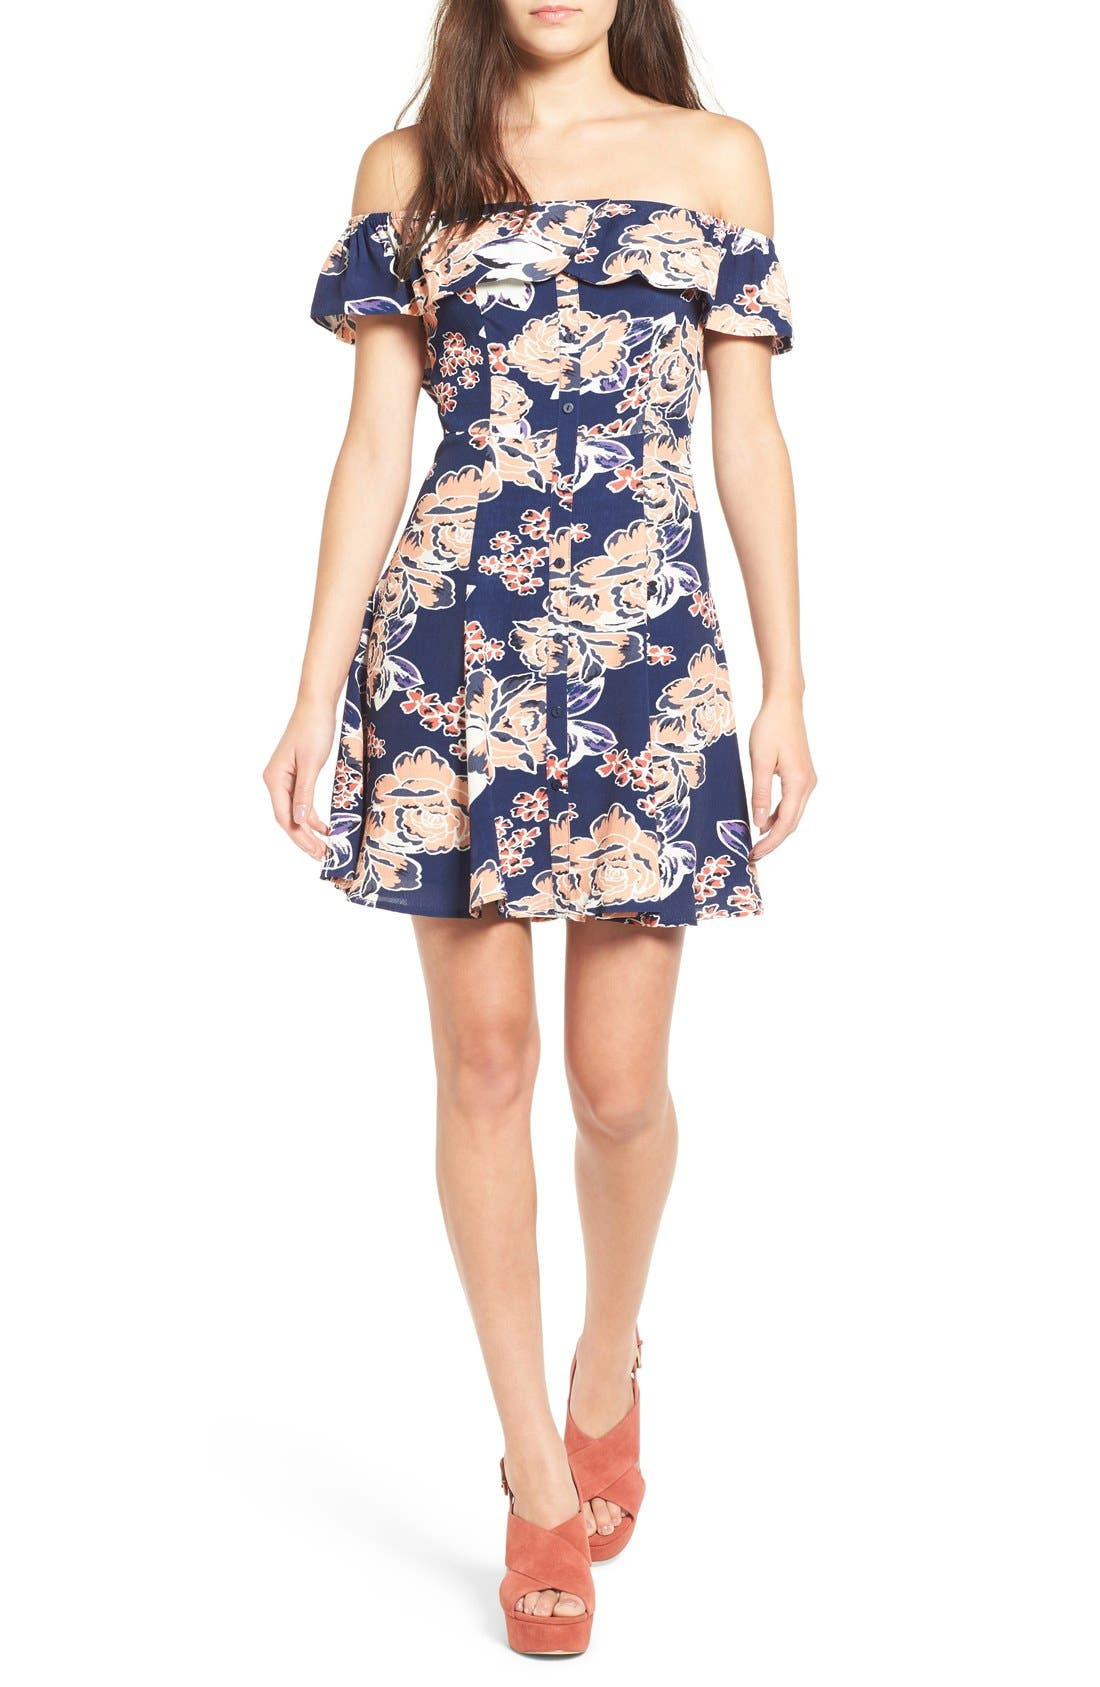 Alternate Image 1 Selected - Lovers + Friends 'Vineyard' Floral Print Off the Shoulder Minidress